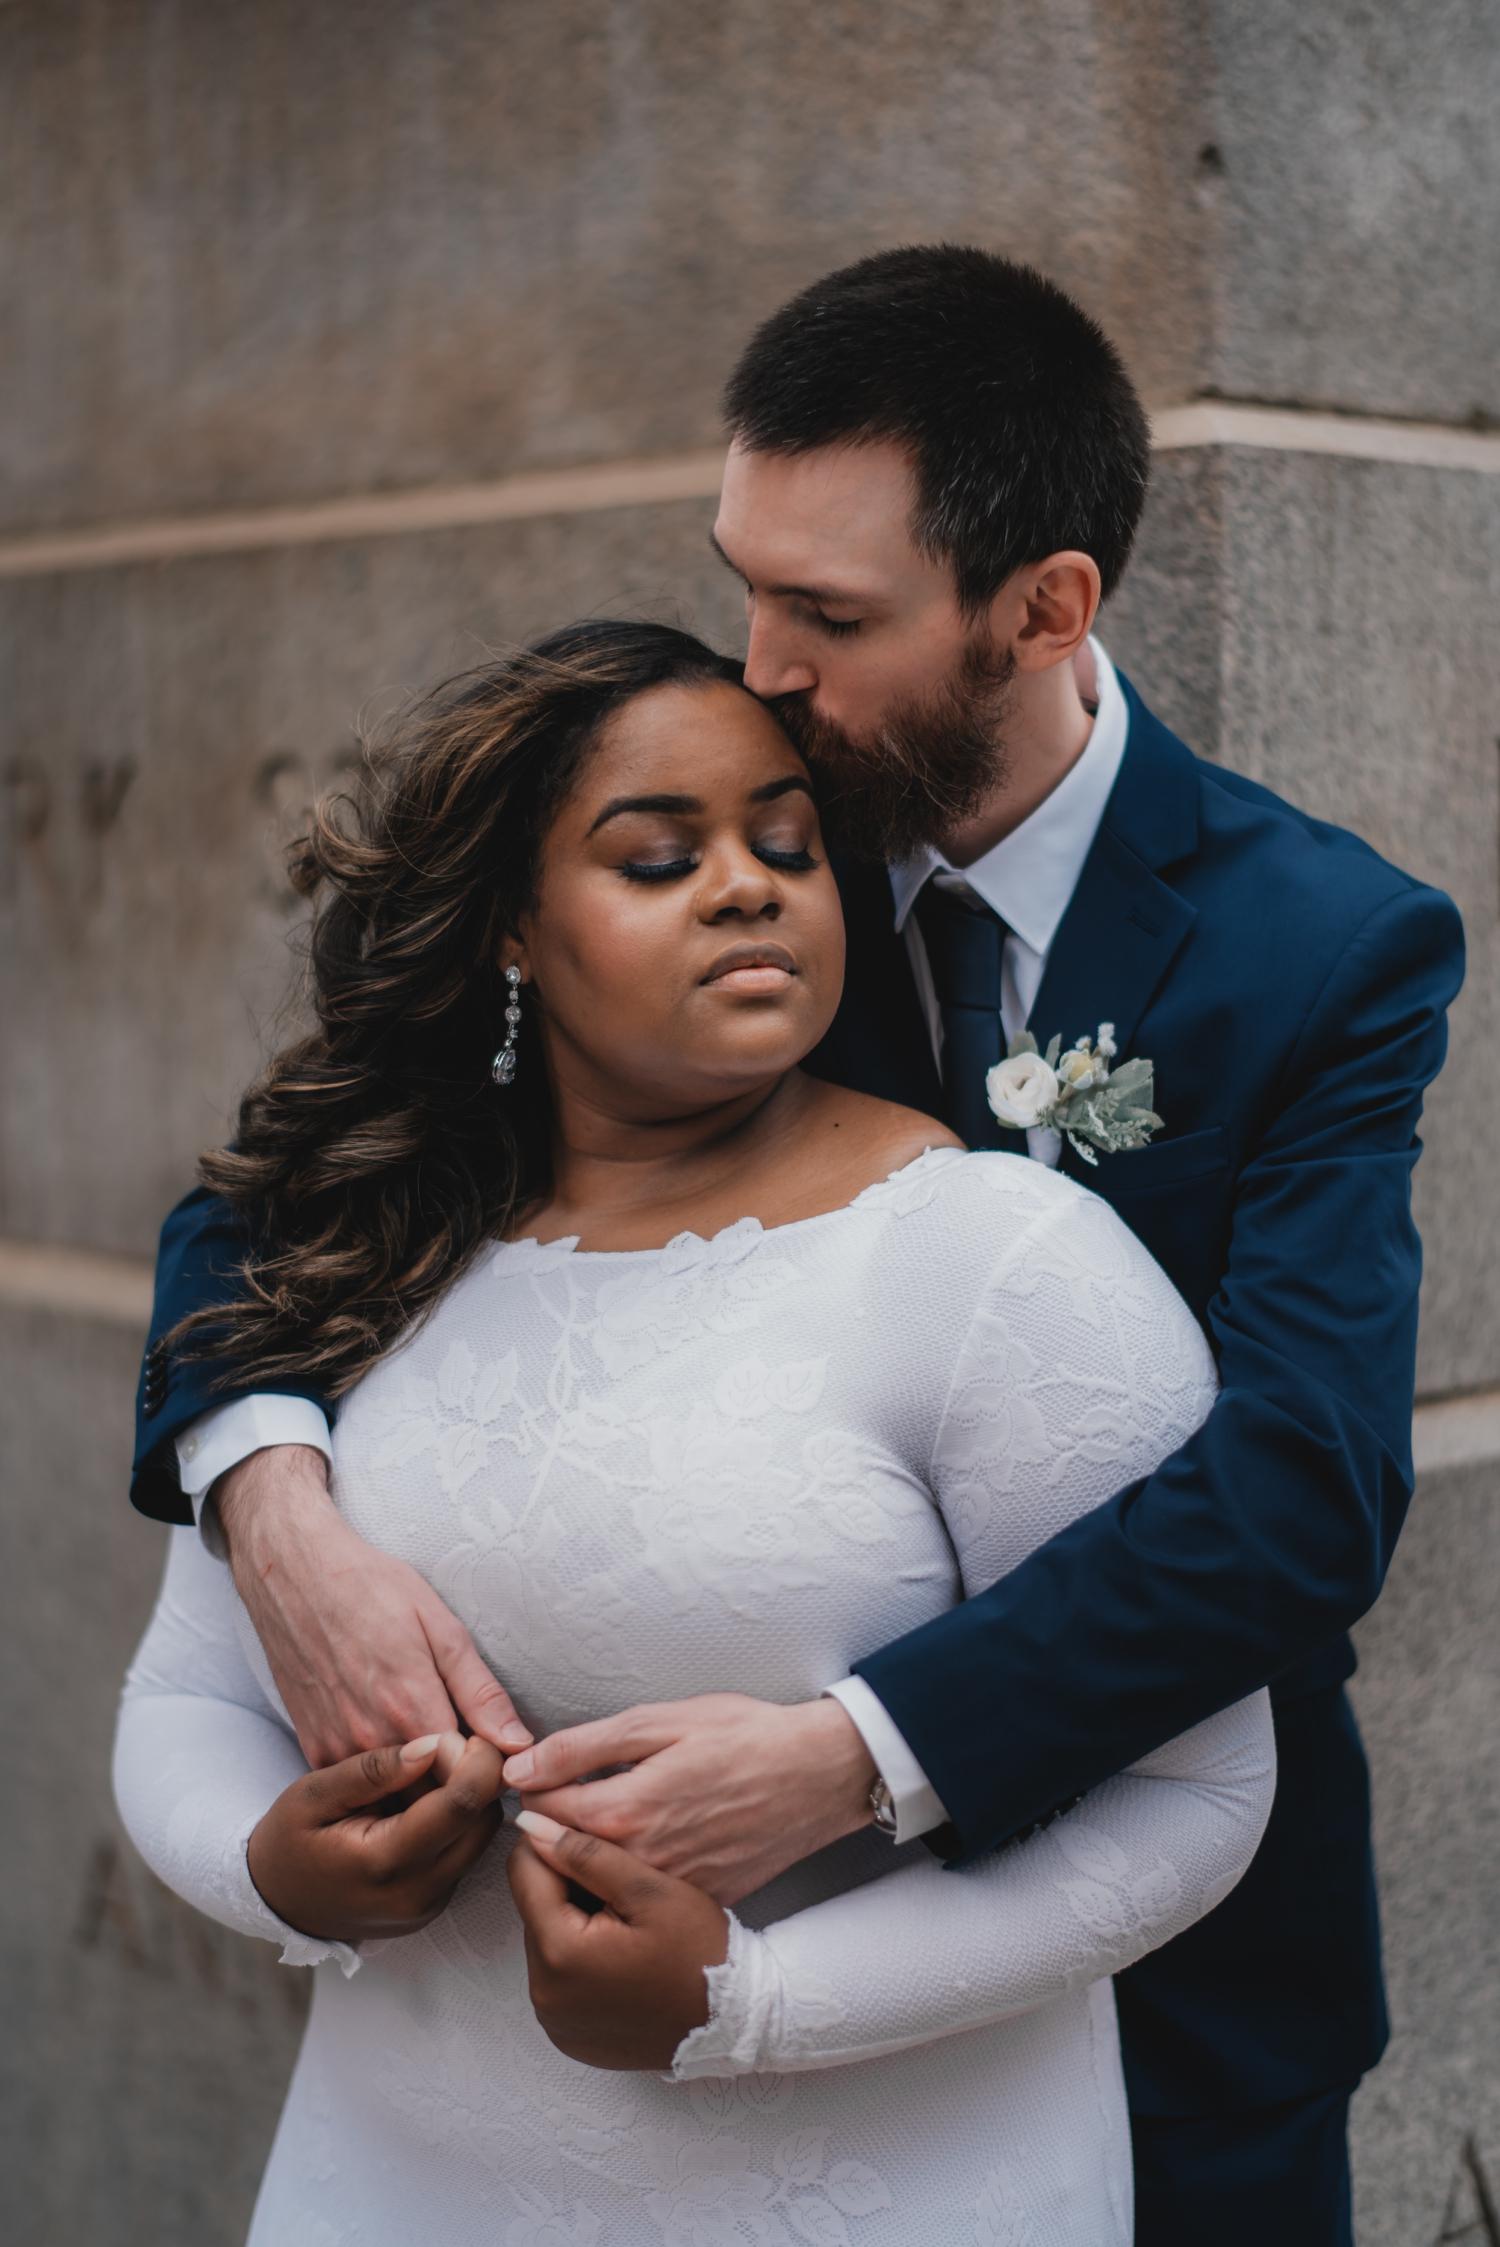 Chicago Elopement photographer - The Adamkovi, bride and groom romantic photo